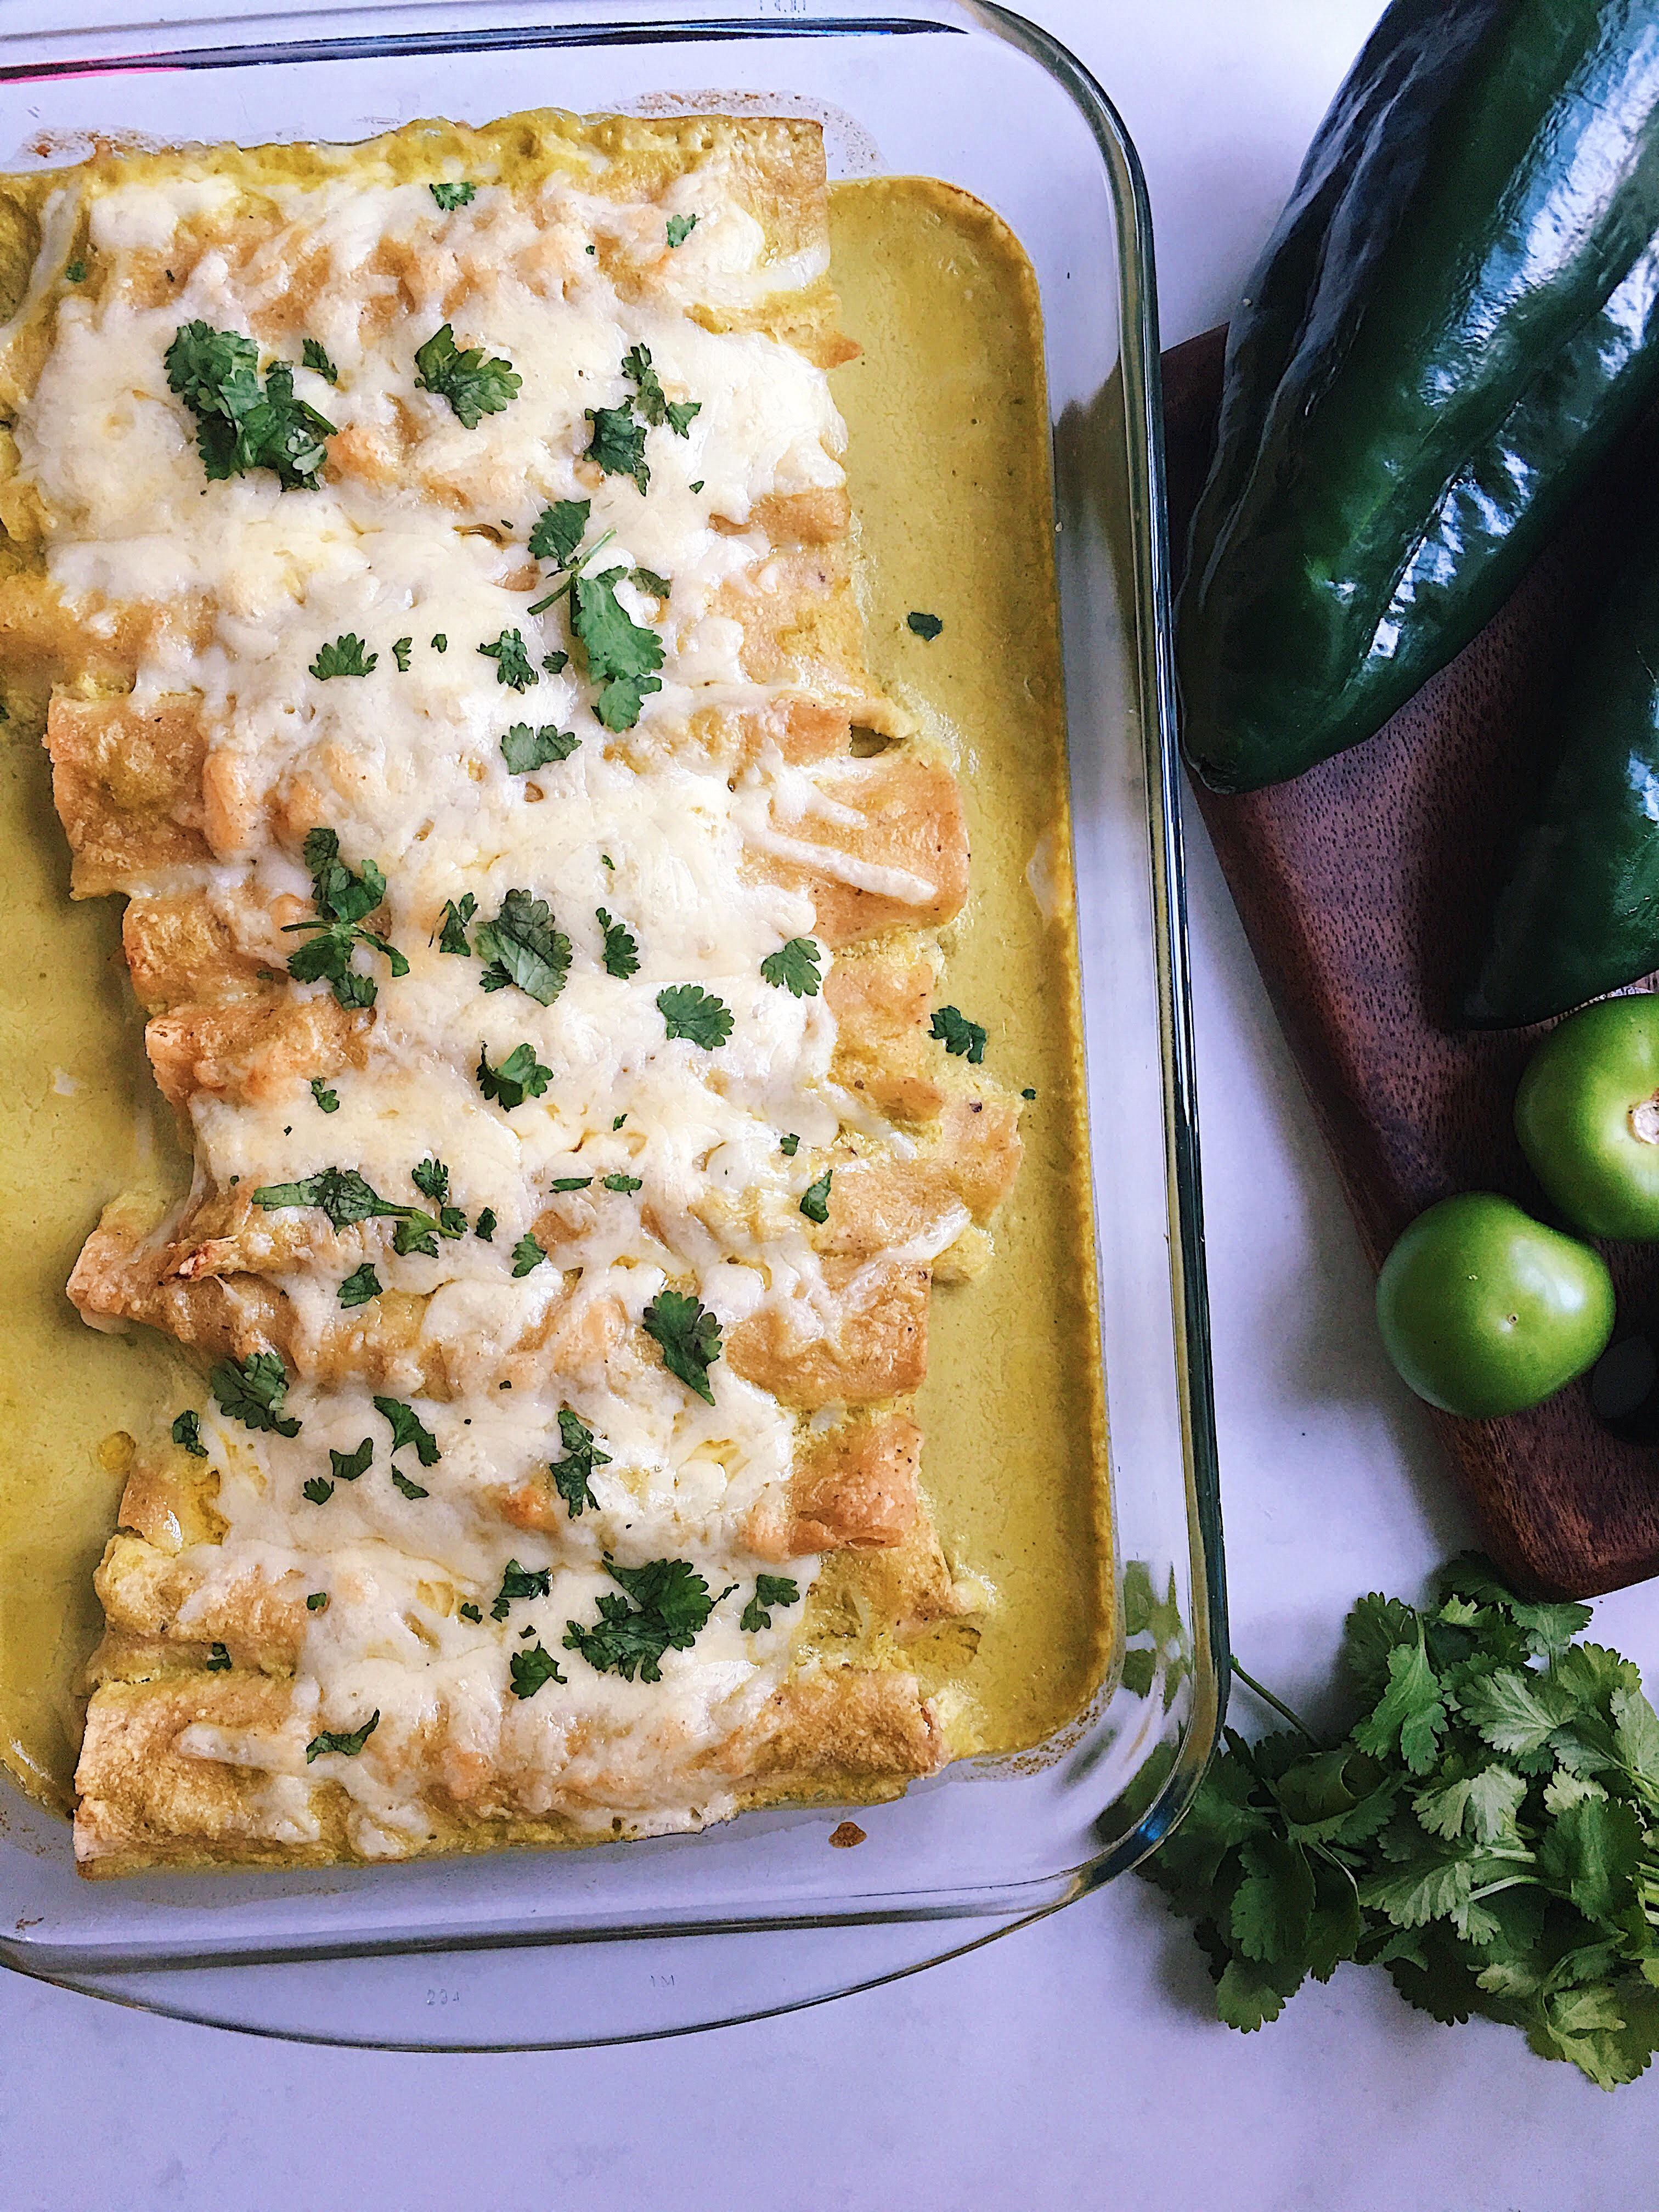 Enchiladas Suizas (Swiss Enchiladas)